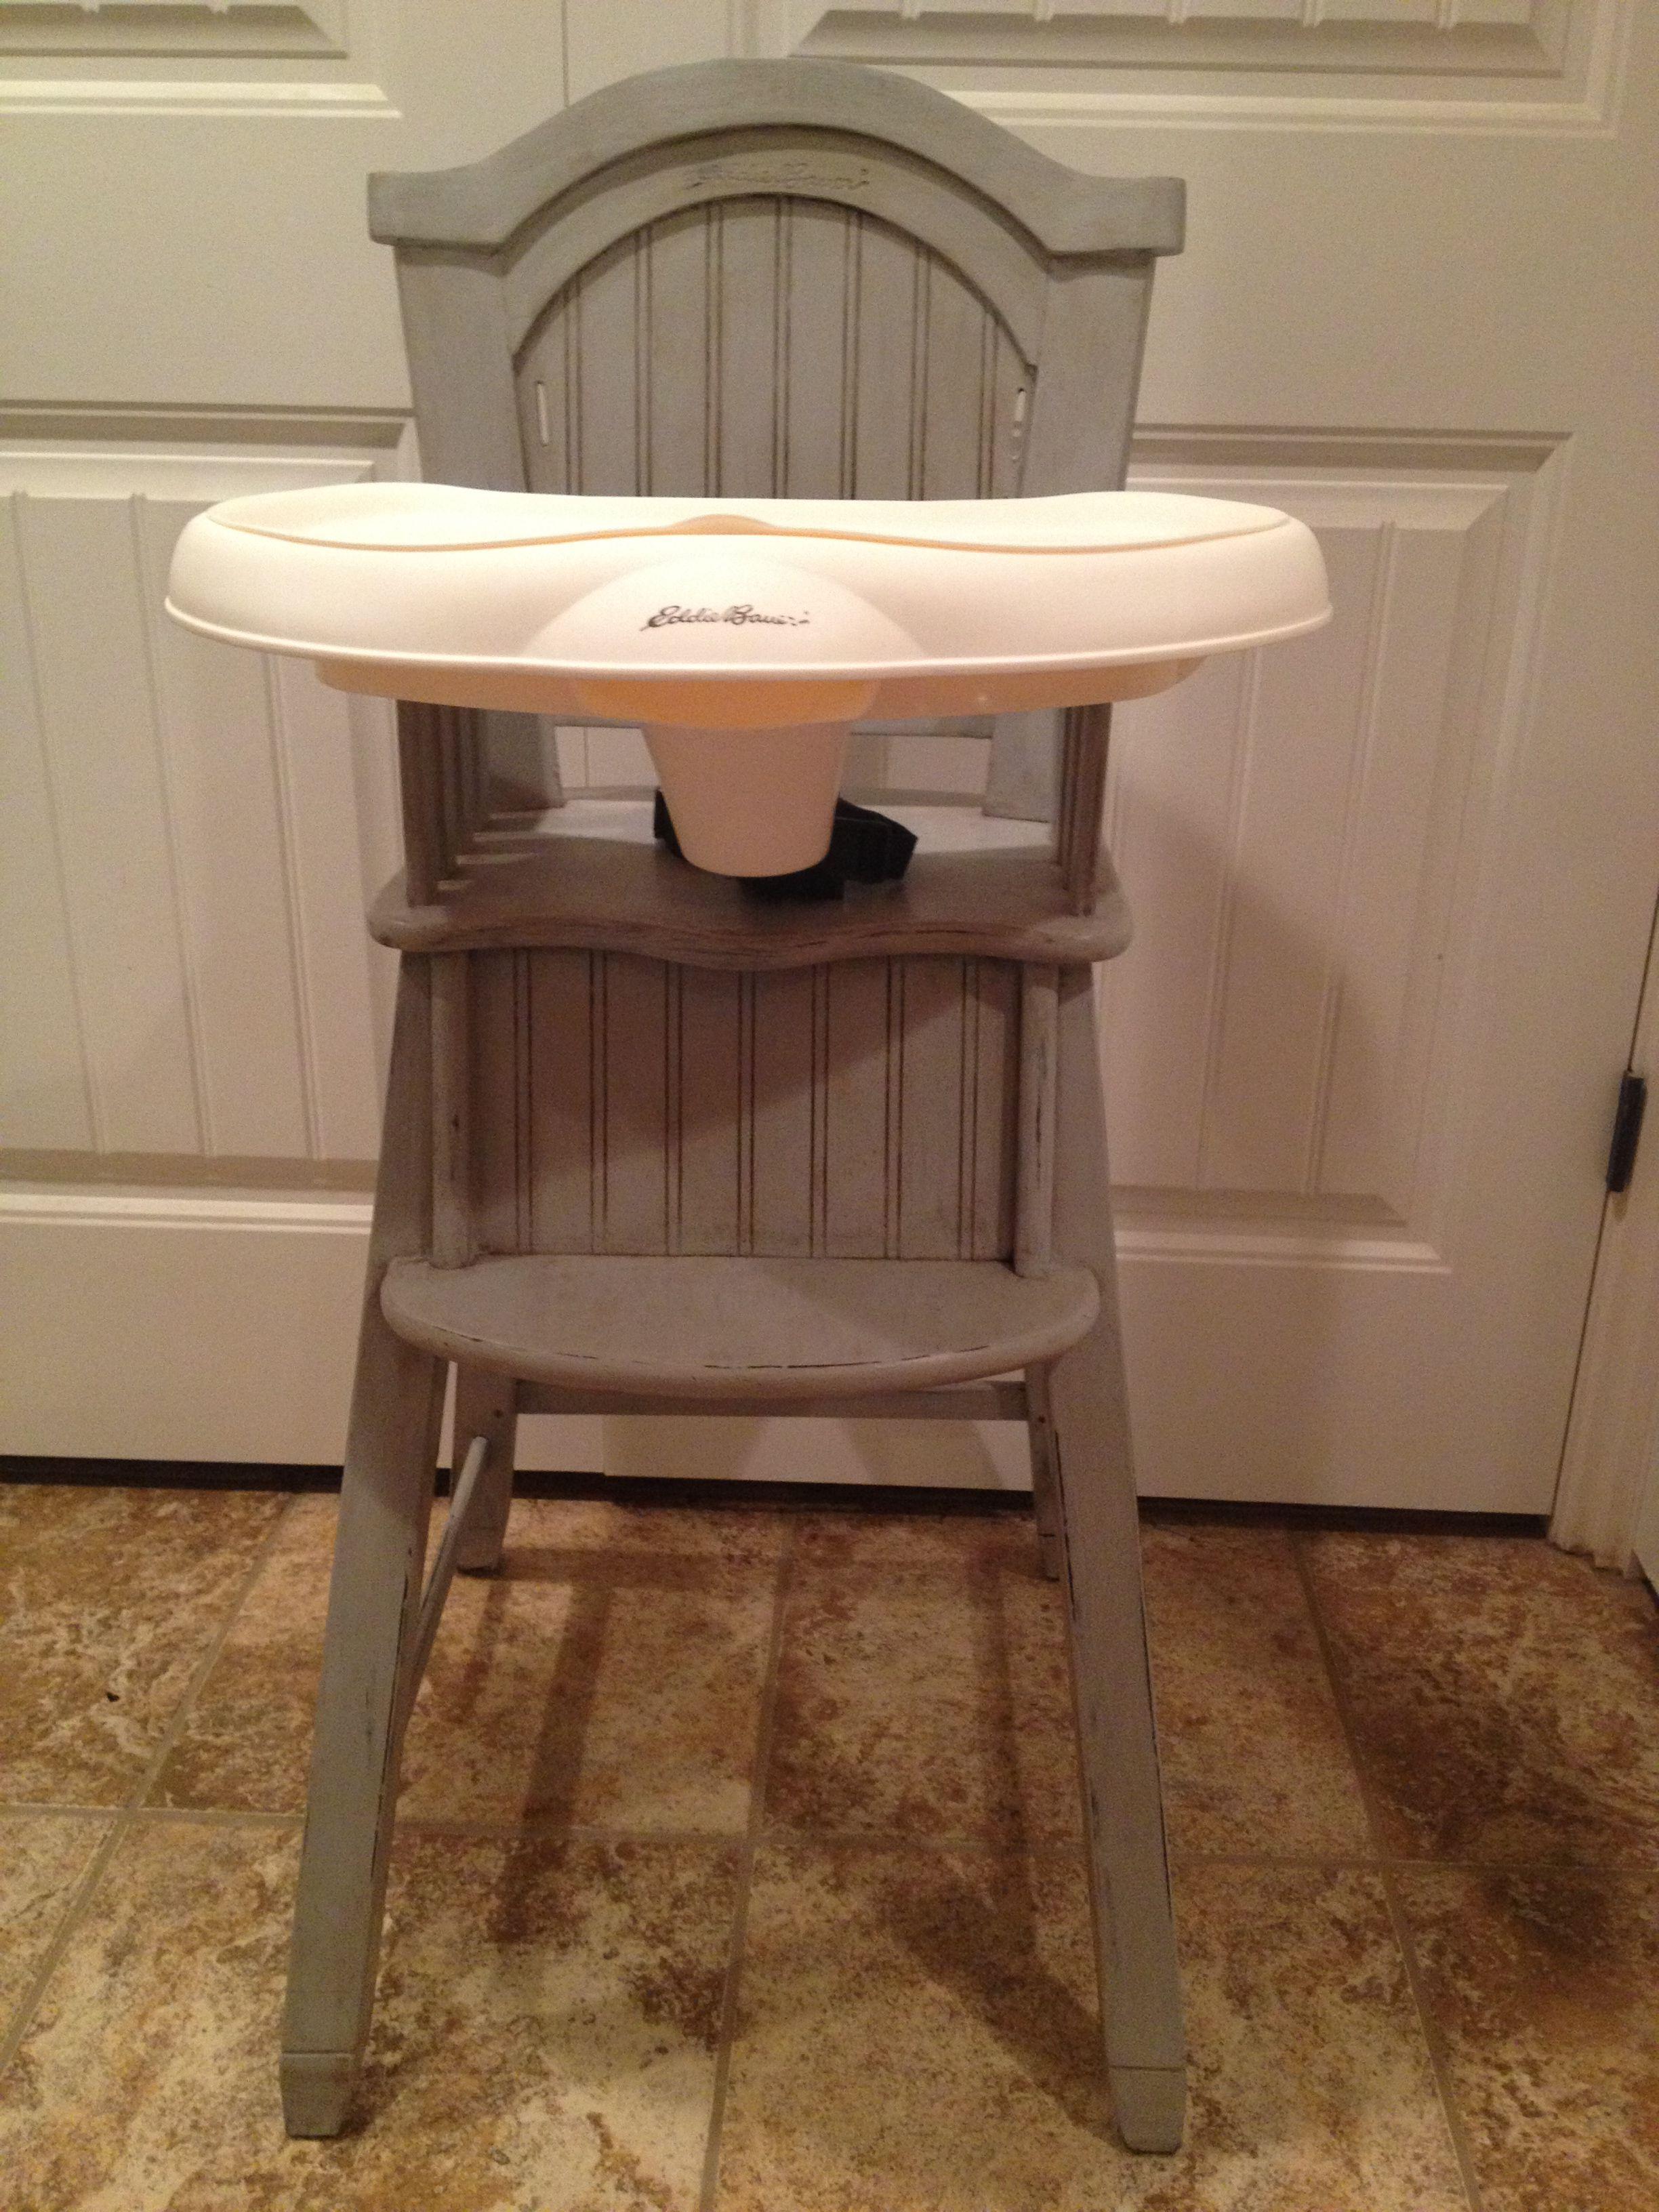 high chairs that attach to table writing desk with chair shabby chic eddie bauer paris grey annie sloan